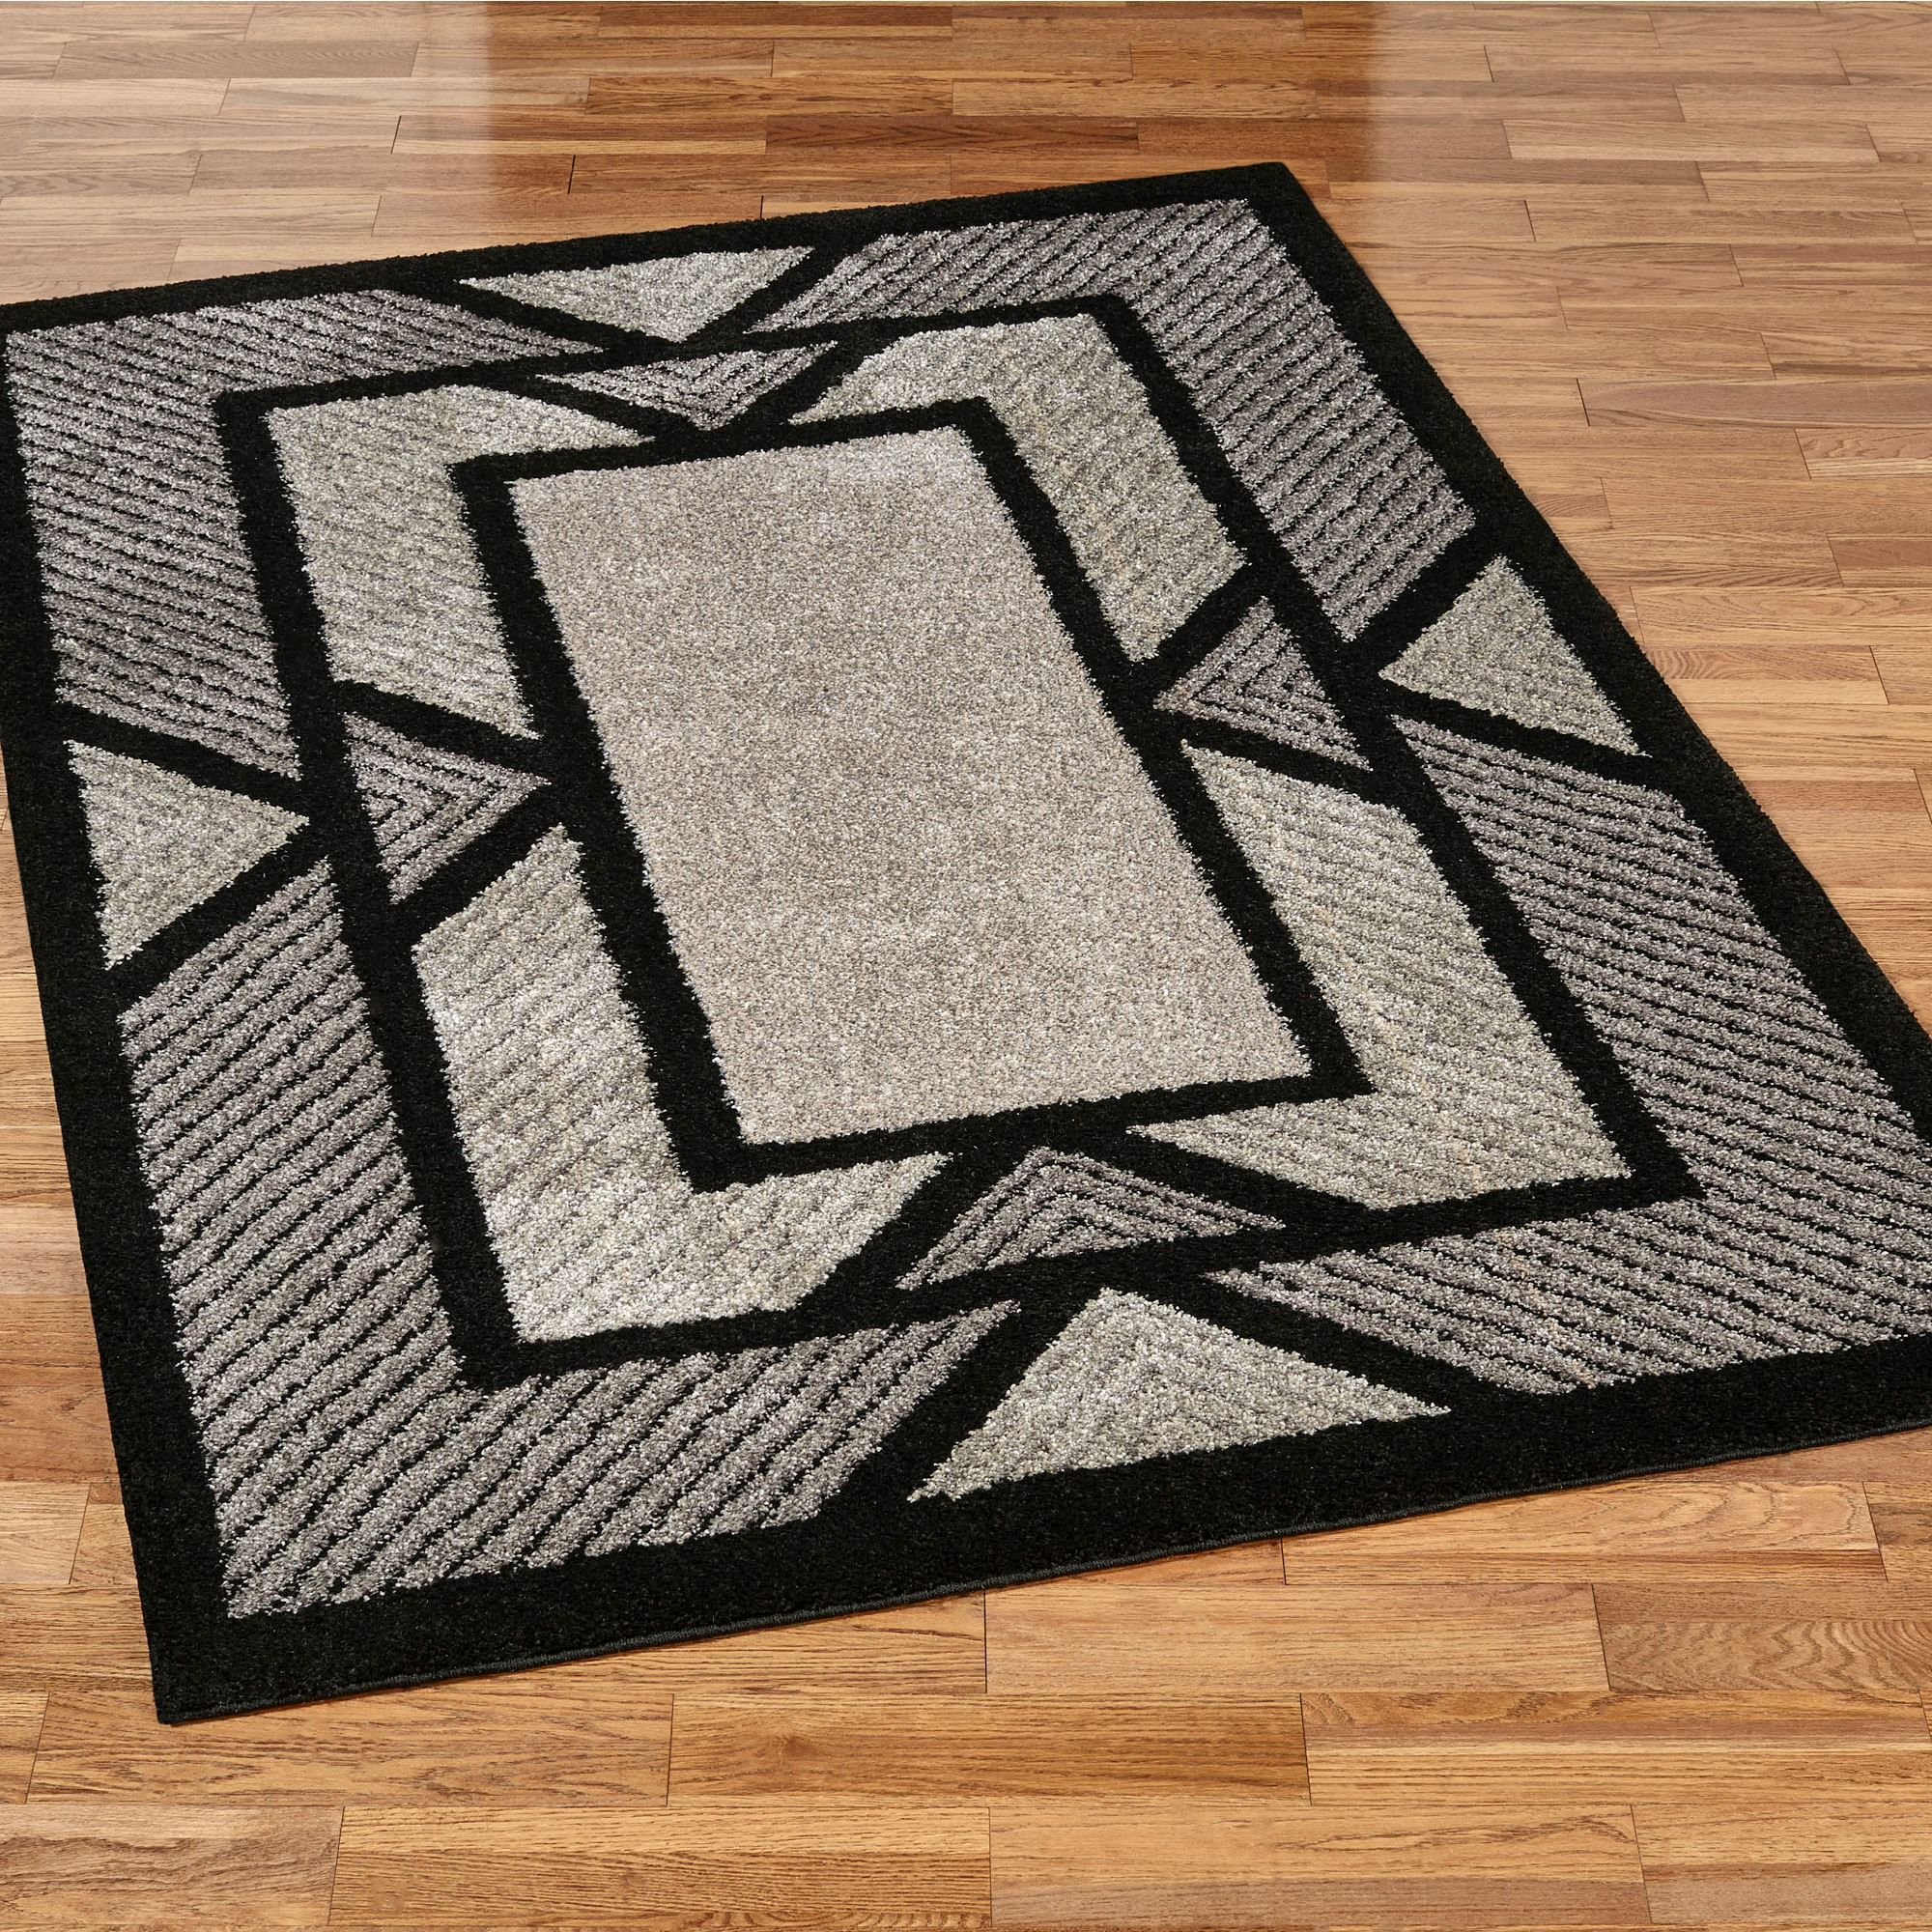 Ternion Black Art Deco Shag Area Rugs Patterns Pinterest